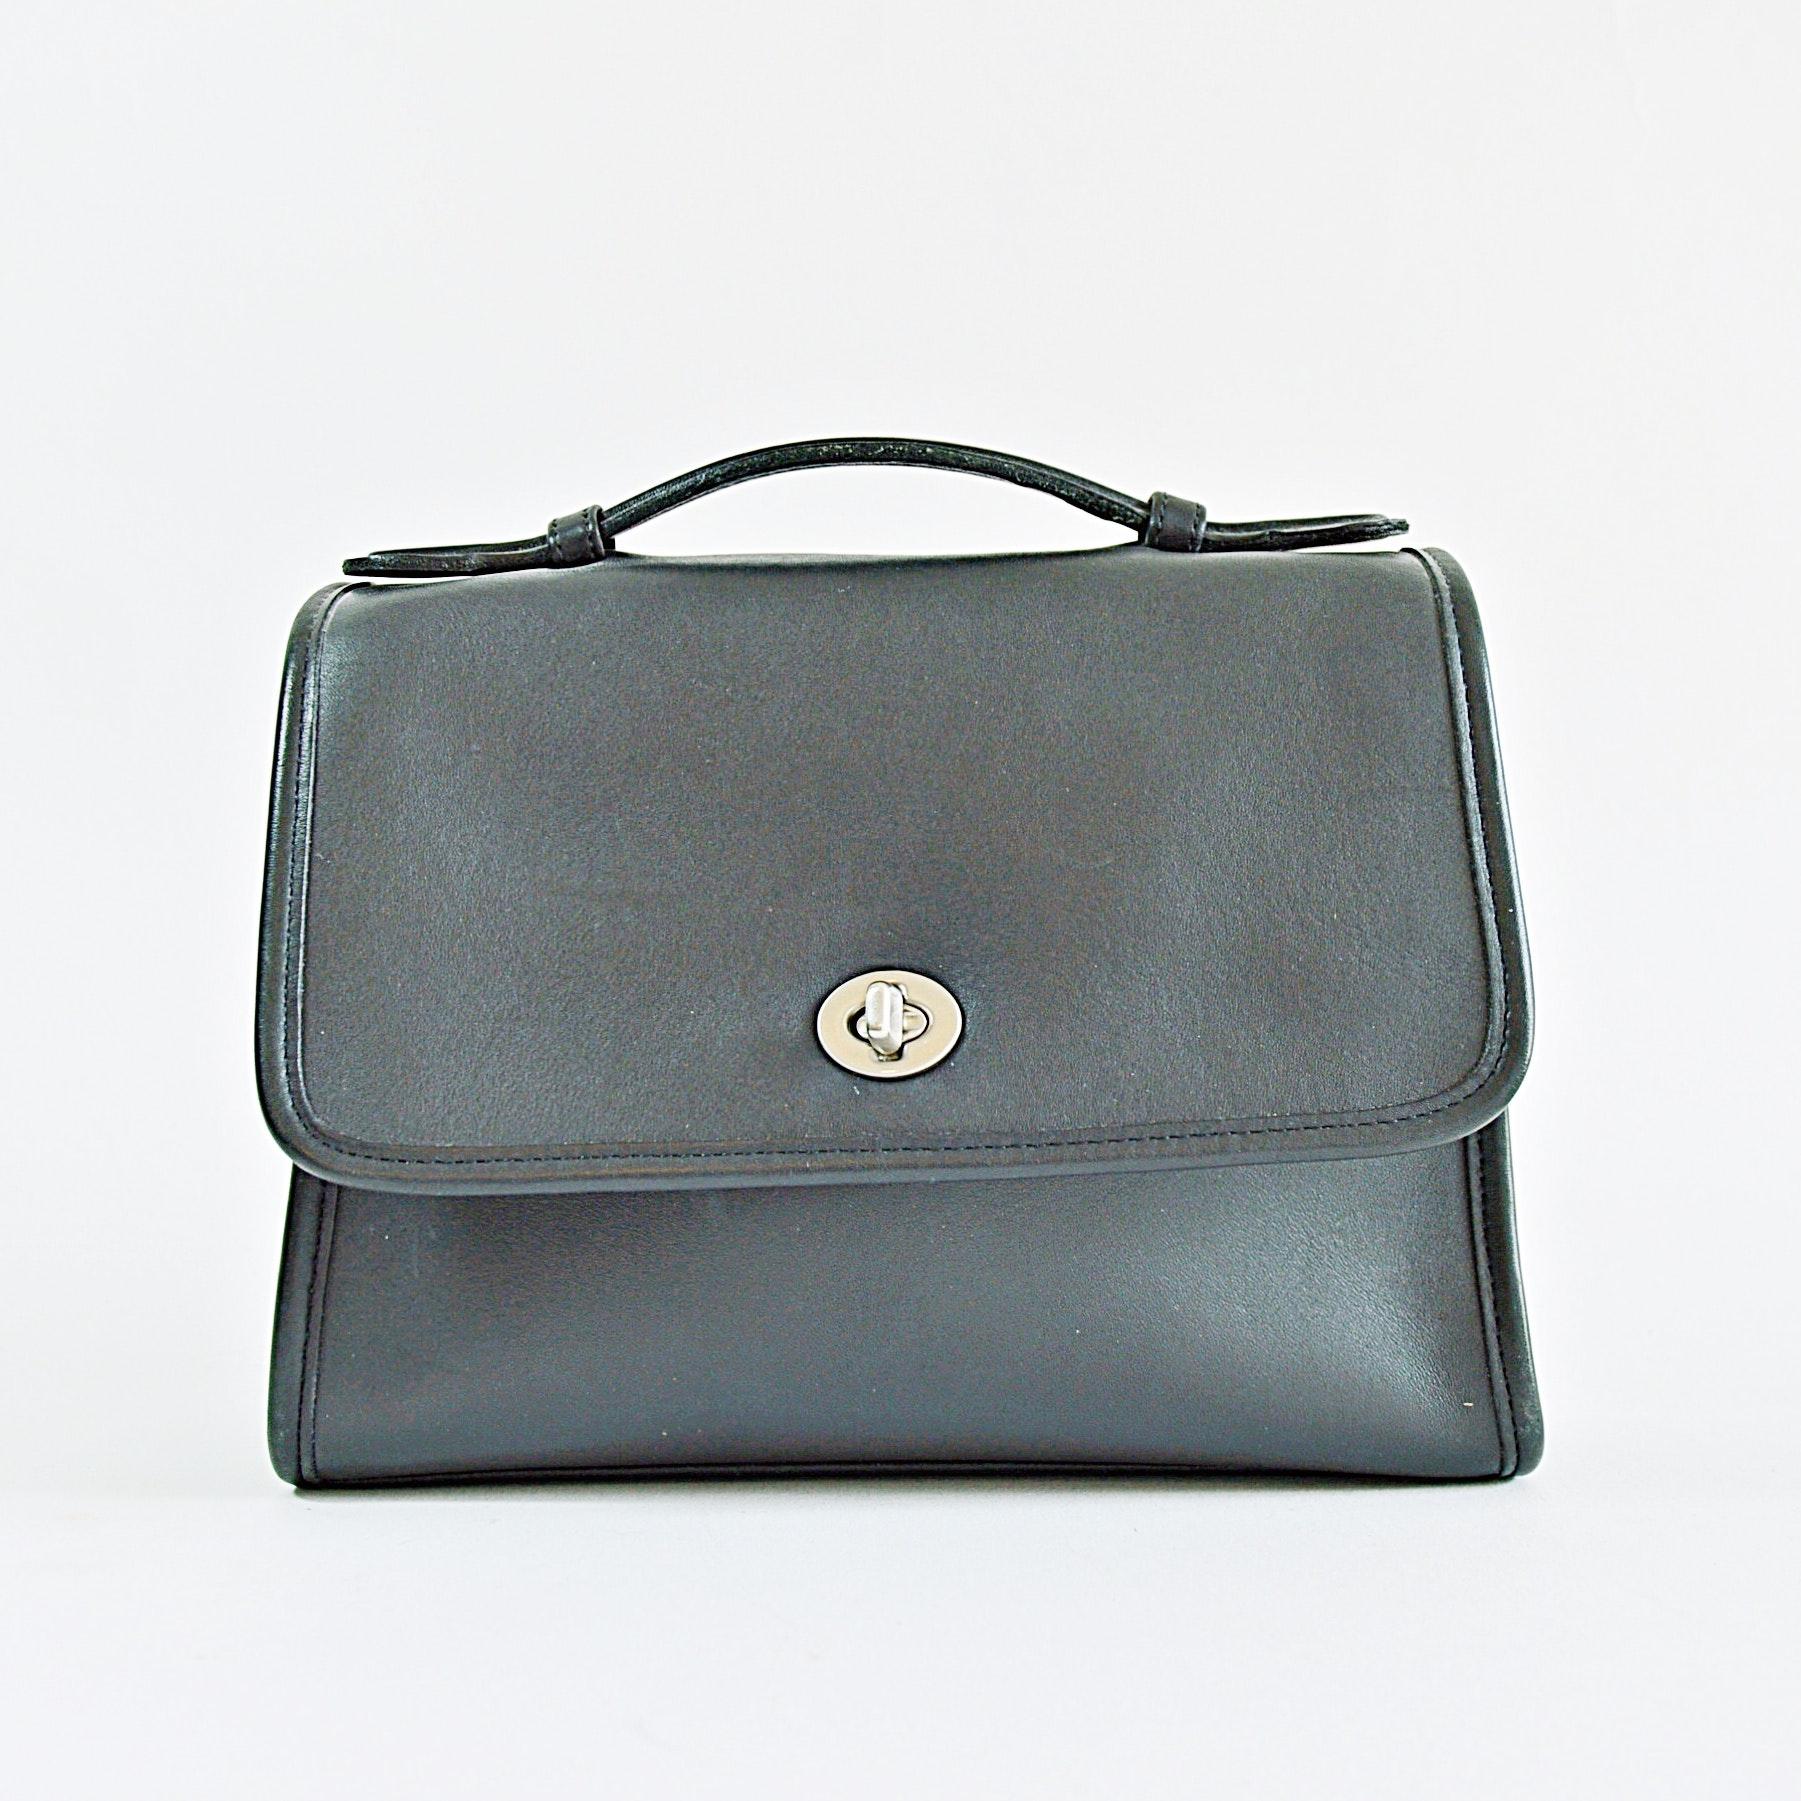 Coach Black Leather Handbag and Wallet